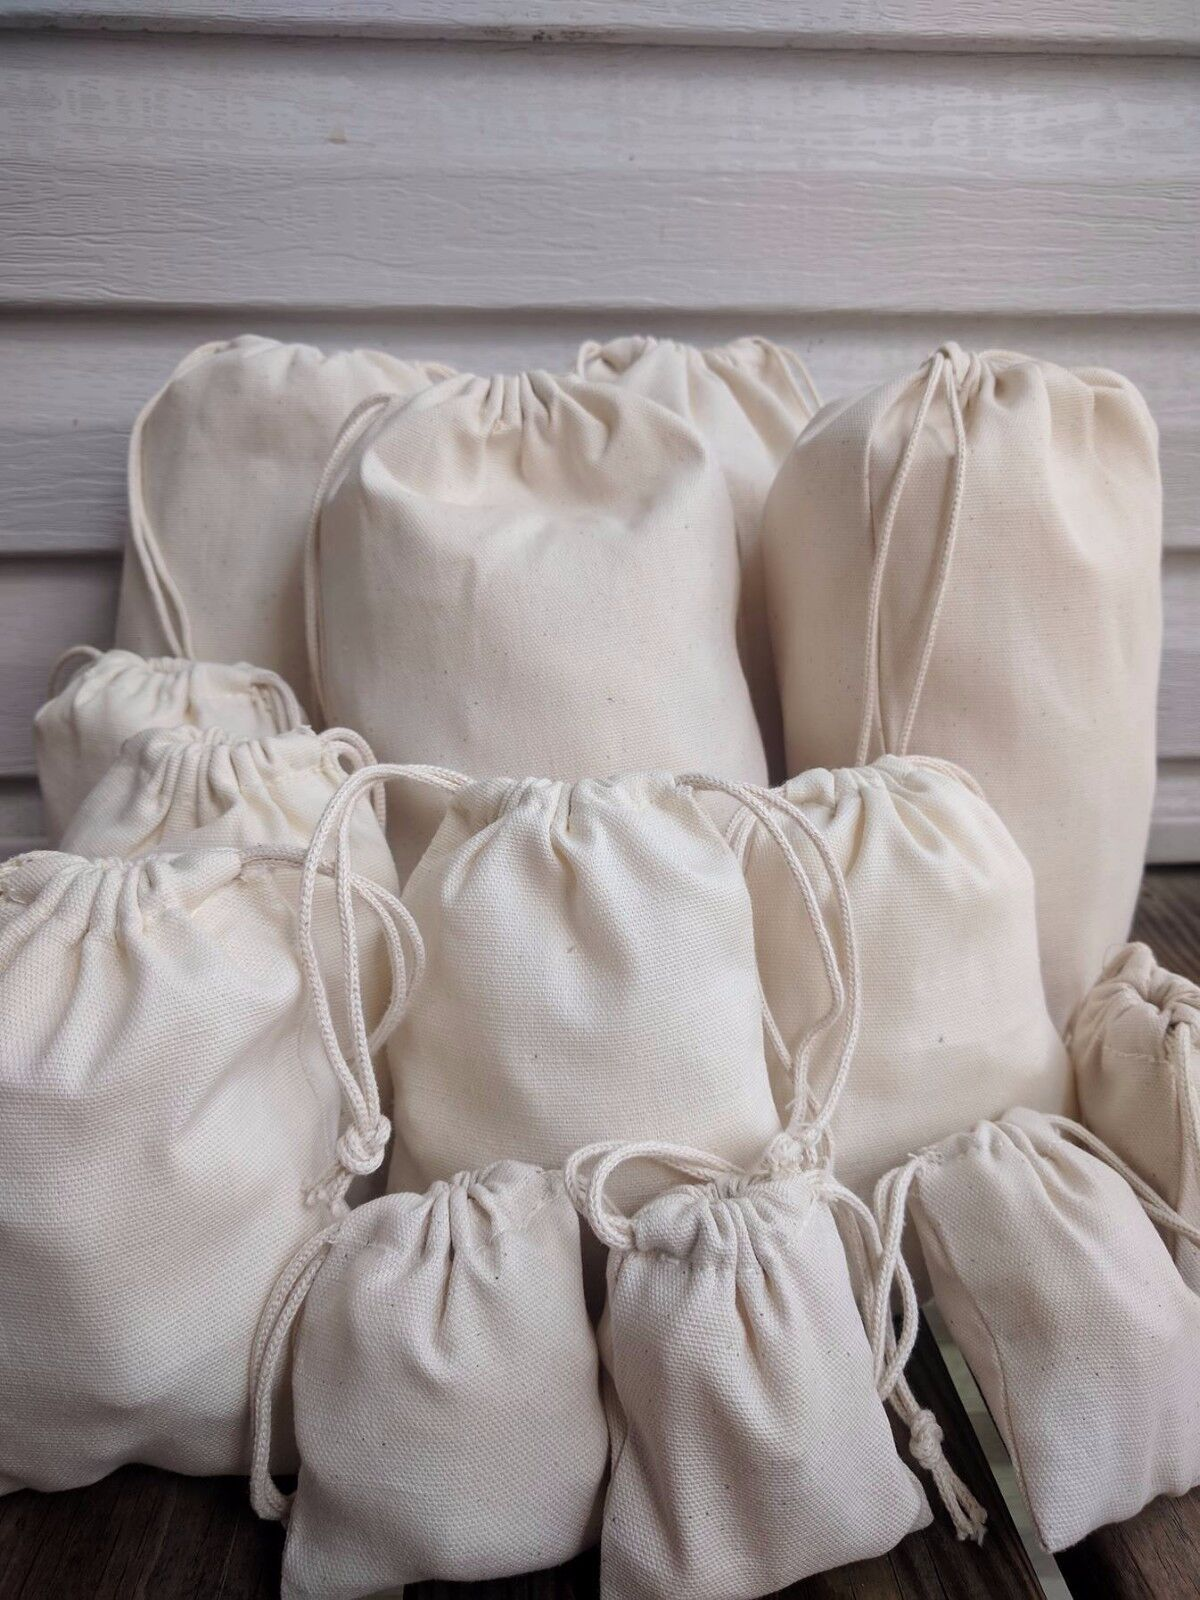 8 x 10 Inches Organic Cotton Canvas Muslin Drawstring Bag. Premium Quality Bags.